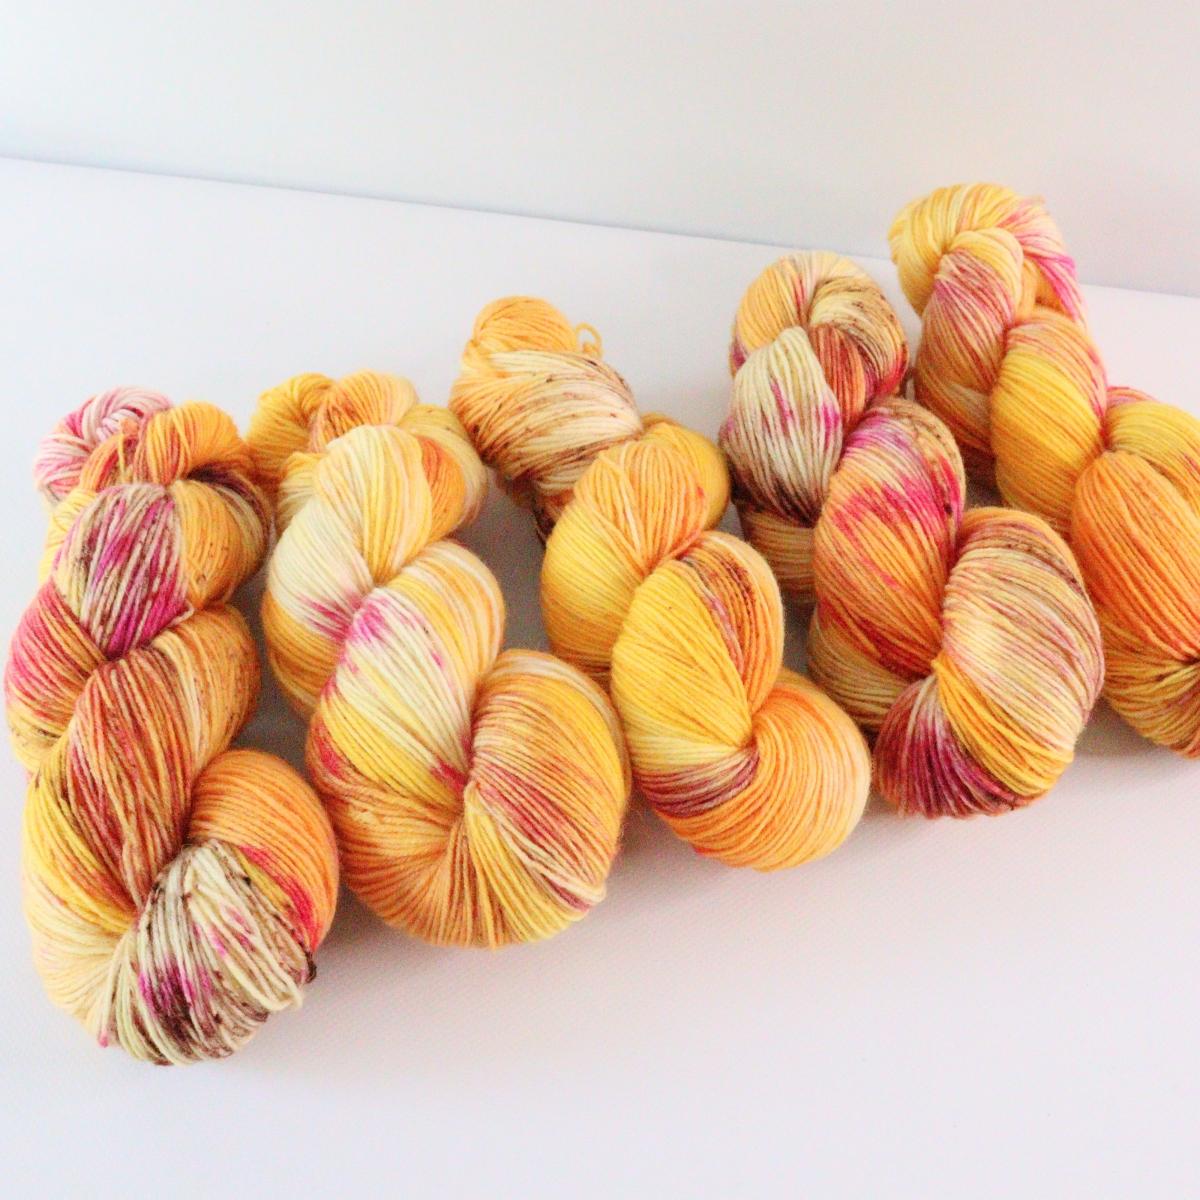 woodico.pro hand dyed yarn 071 1 1200x1200 - Hand dyed yarn / 071